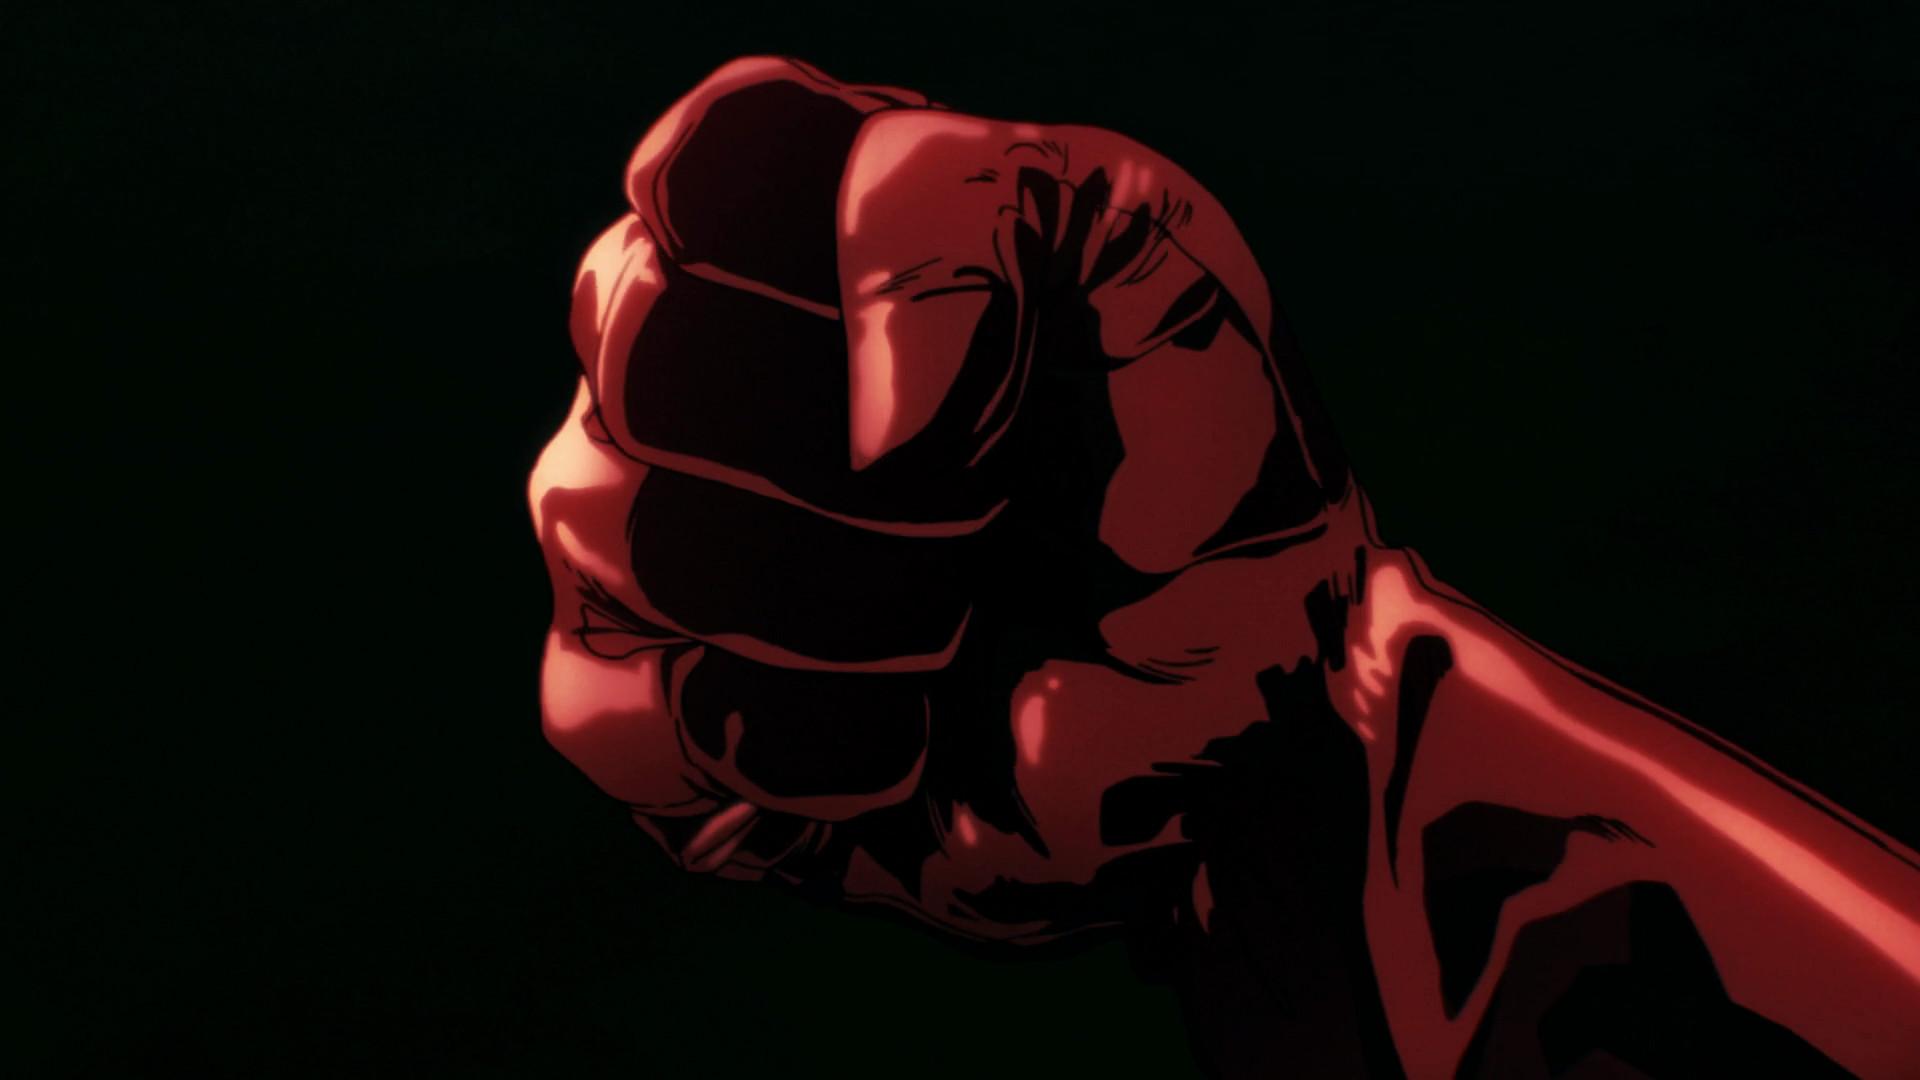 One-Punch Man Screencap/Wallpaper dump